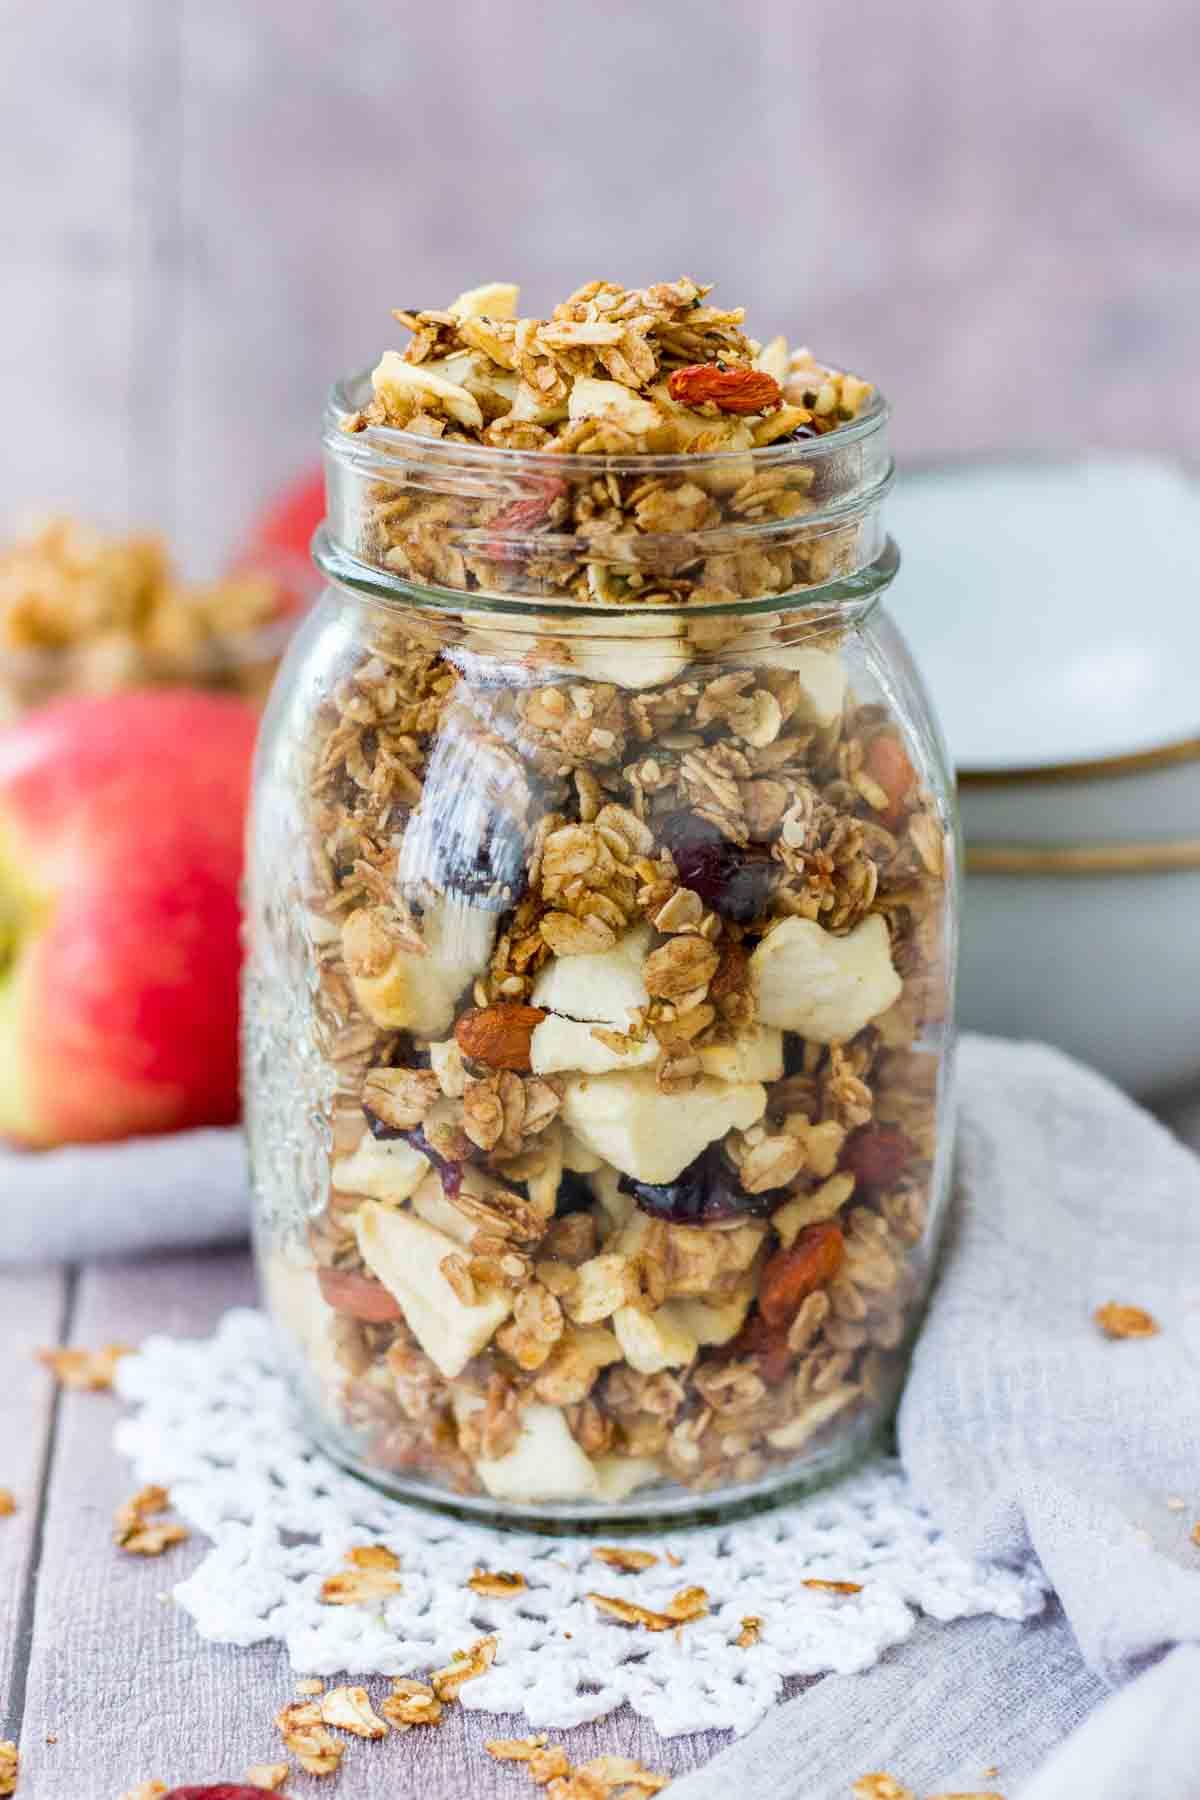 Apple Cinnamon Granola in a glass jar